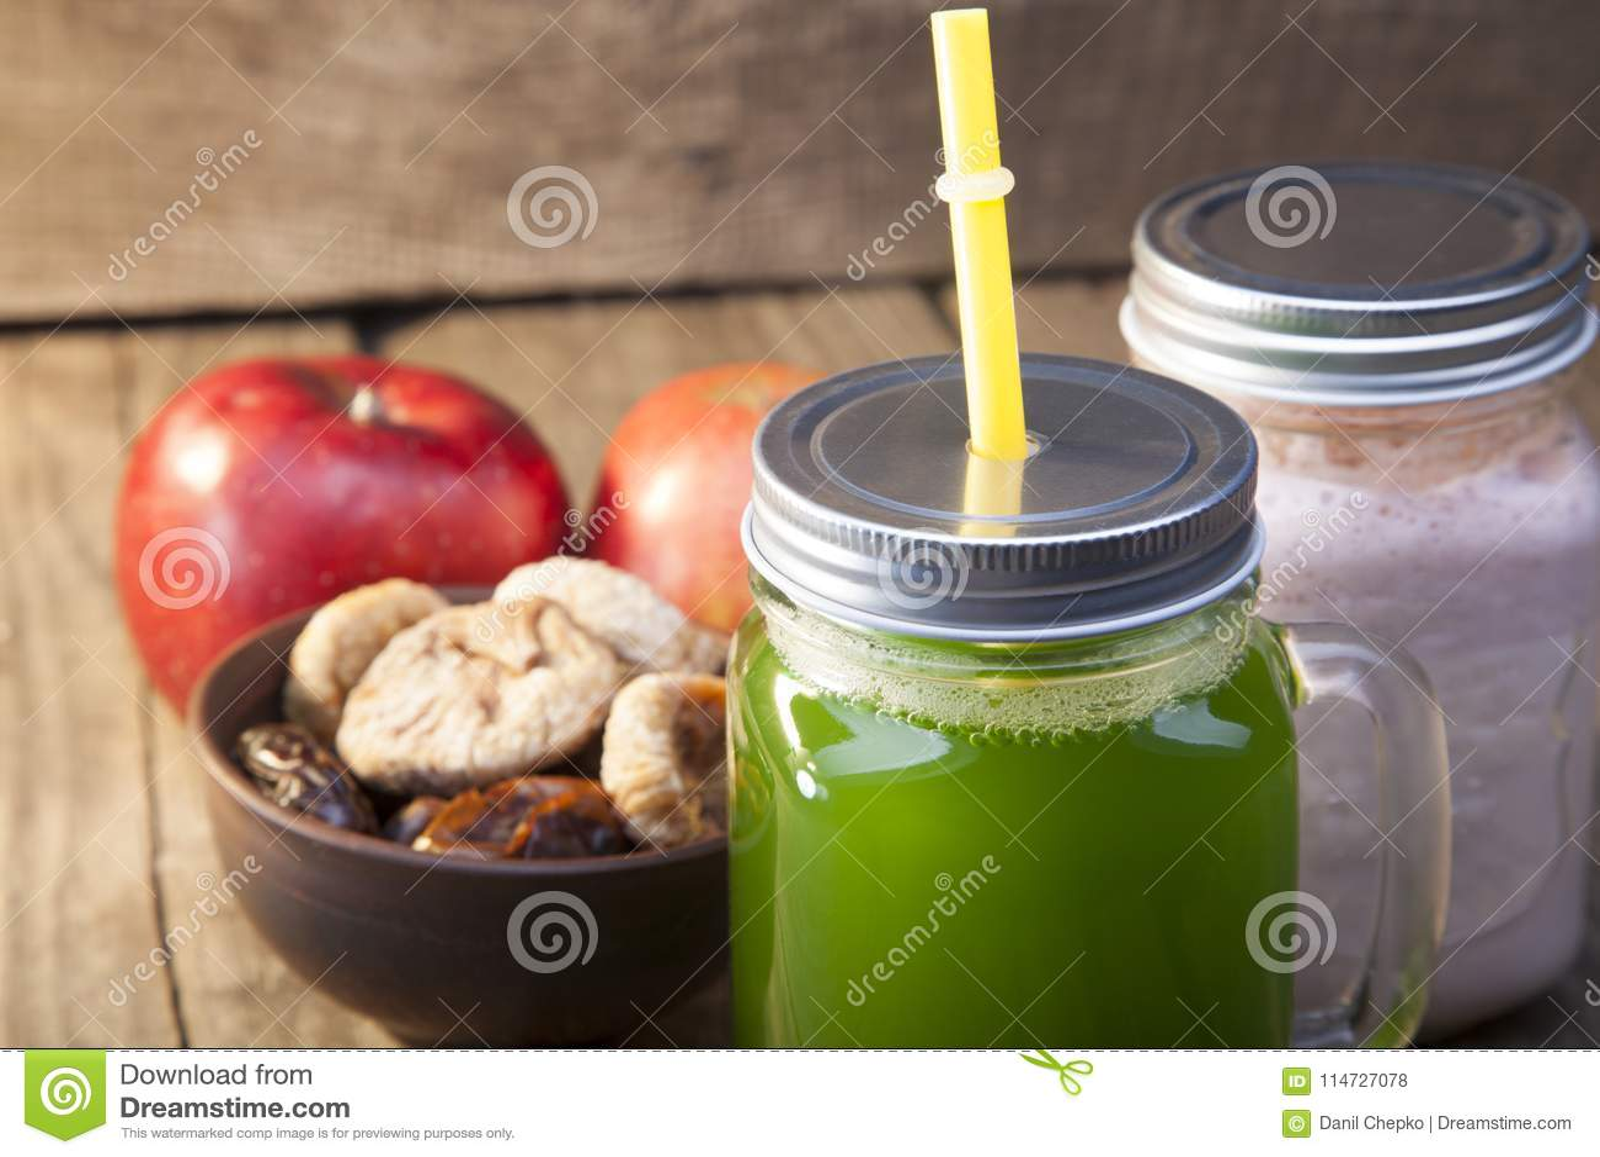 Smoothie in glass jar on rustik wood. Green healthy beverage and